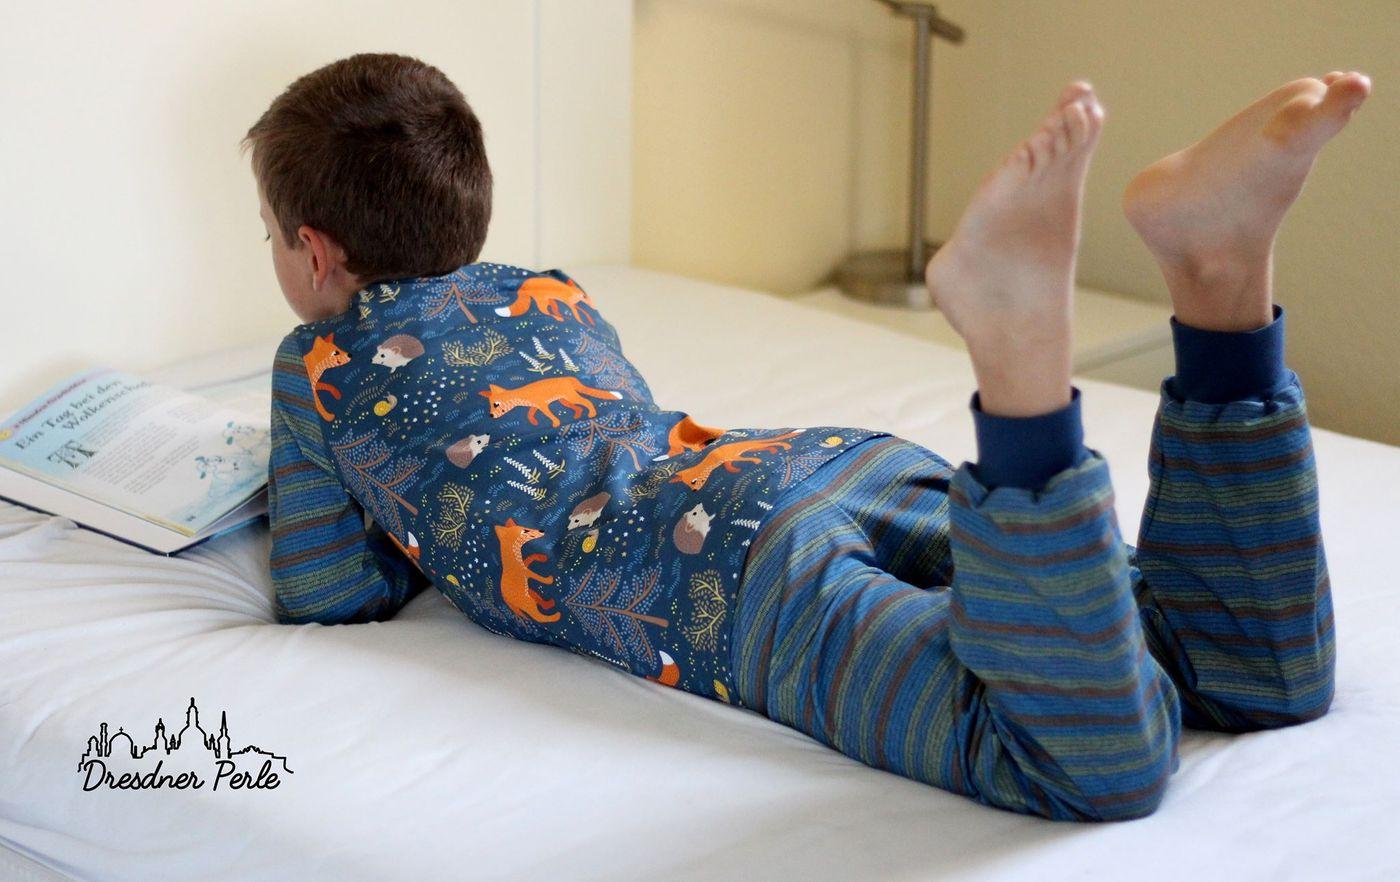 Produktfoto 5 von Happy Pearl für Schnittmuster  Happy Goodnight - Schlafshorty   Nachthemd   Pyjama